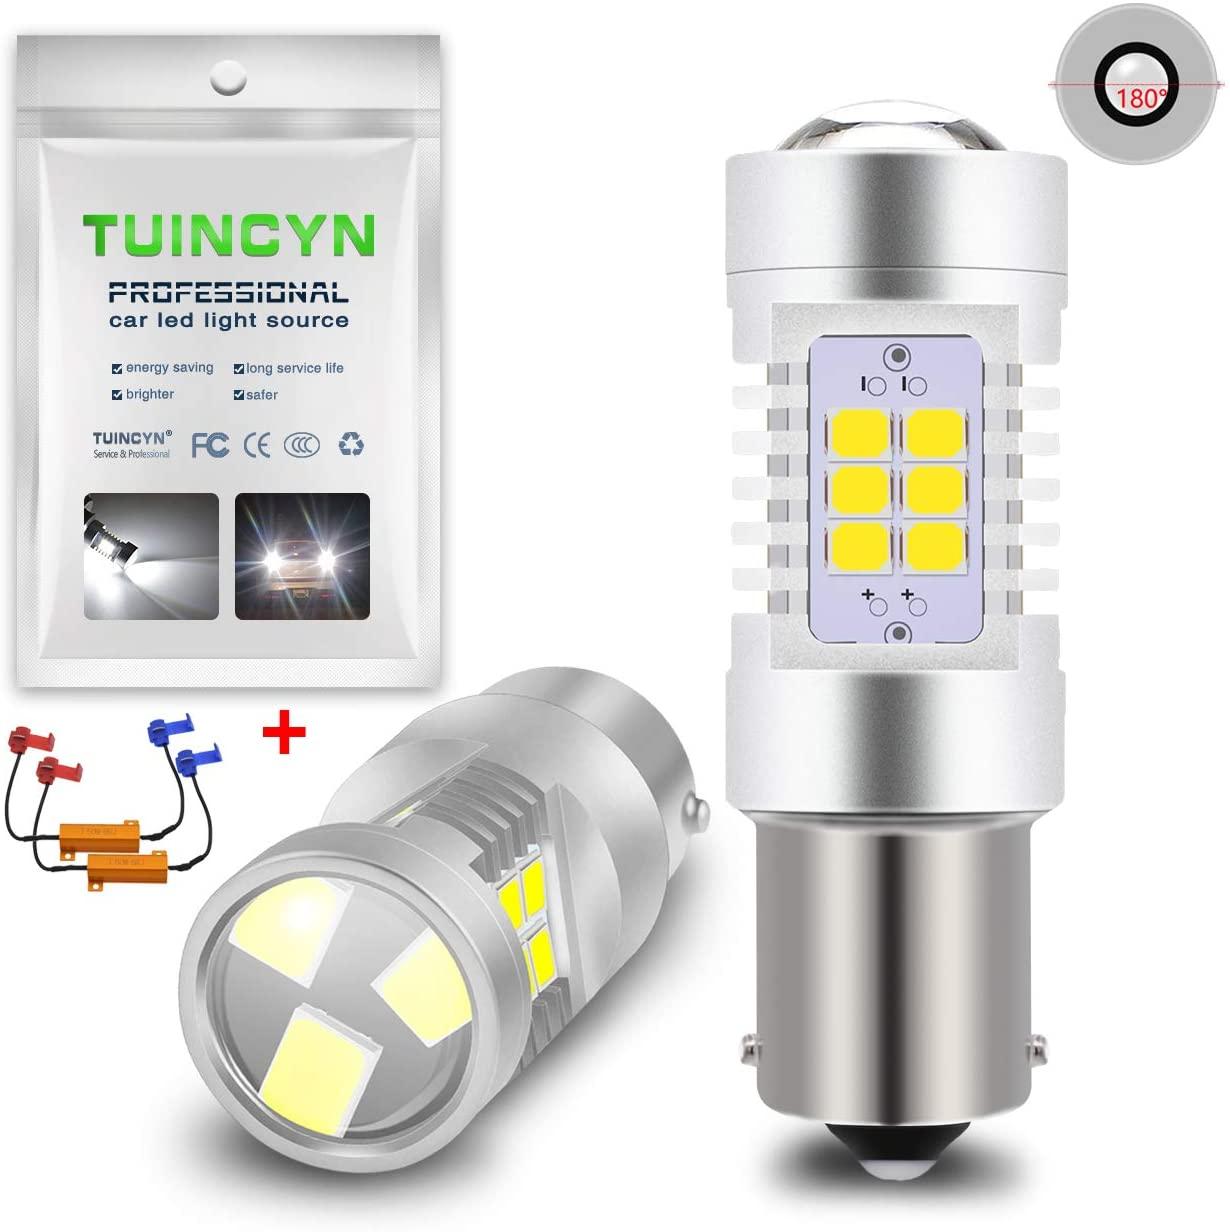 TUINCYN 1156 BA15S P21W LED Light Bulbs White CANBUS 7056 1141 1073 1095 Tail Light Brake Light Interior RV Lamp Turn Signal Light Stop Blinker Light with 50W 8 Ohm LED Load Resistors(2-Pack)